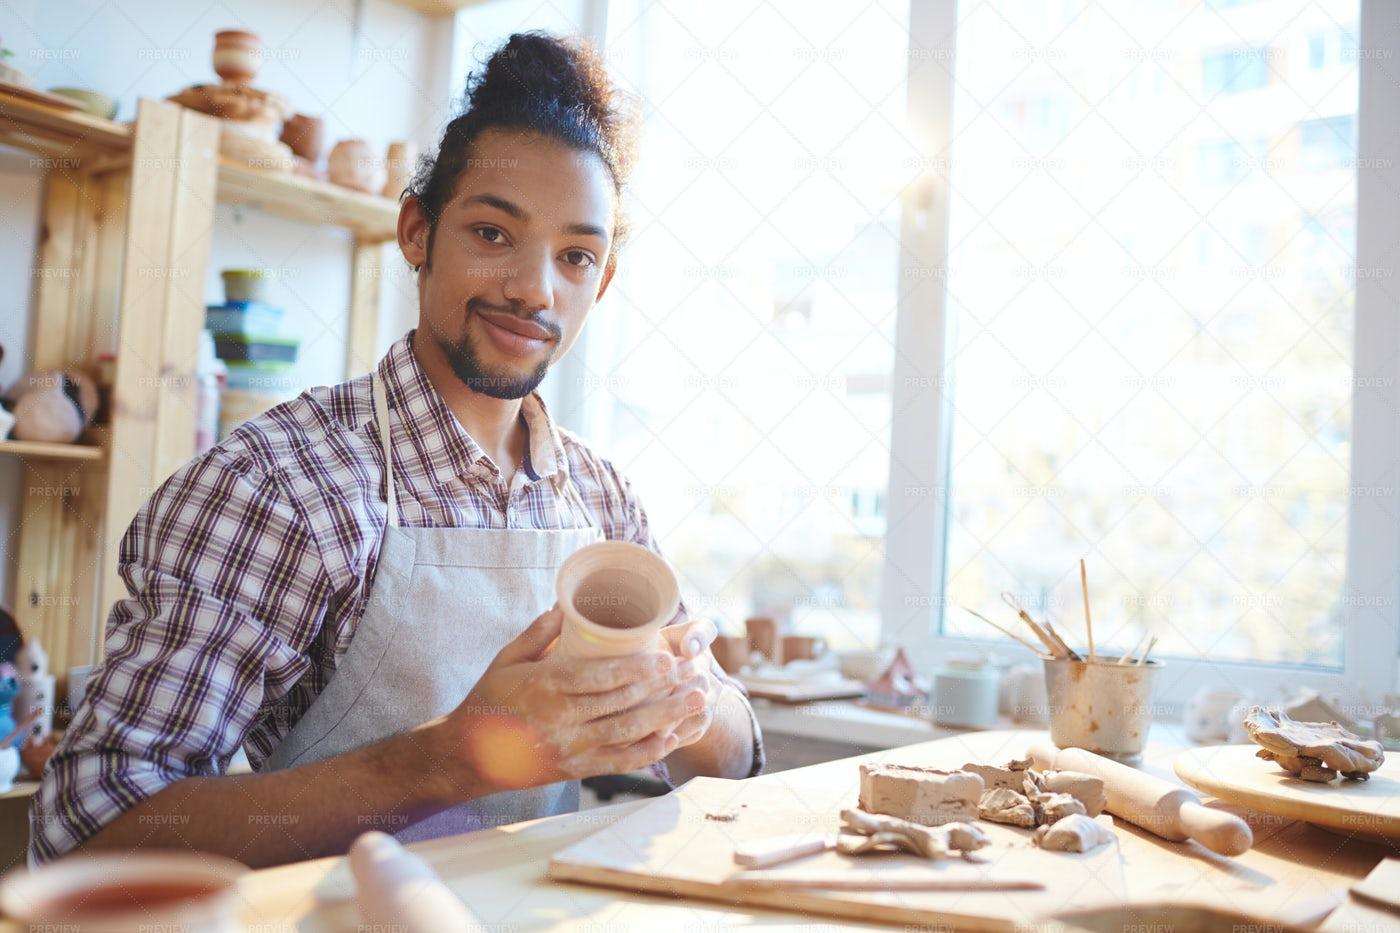 Ceramist With Handmade Vase: Stock Photos